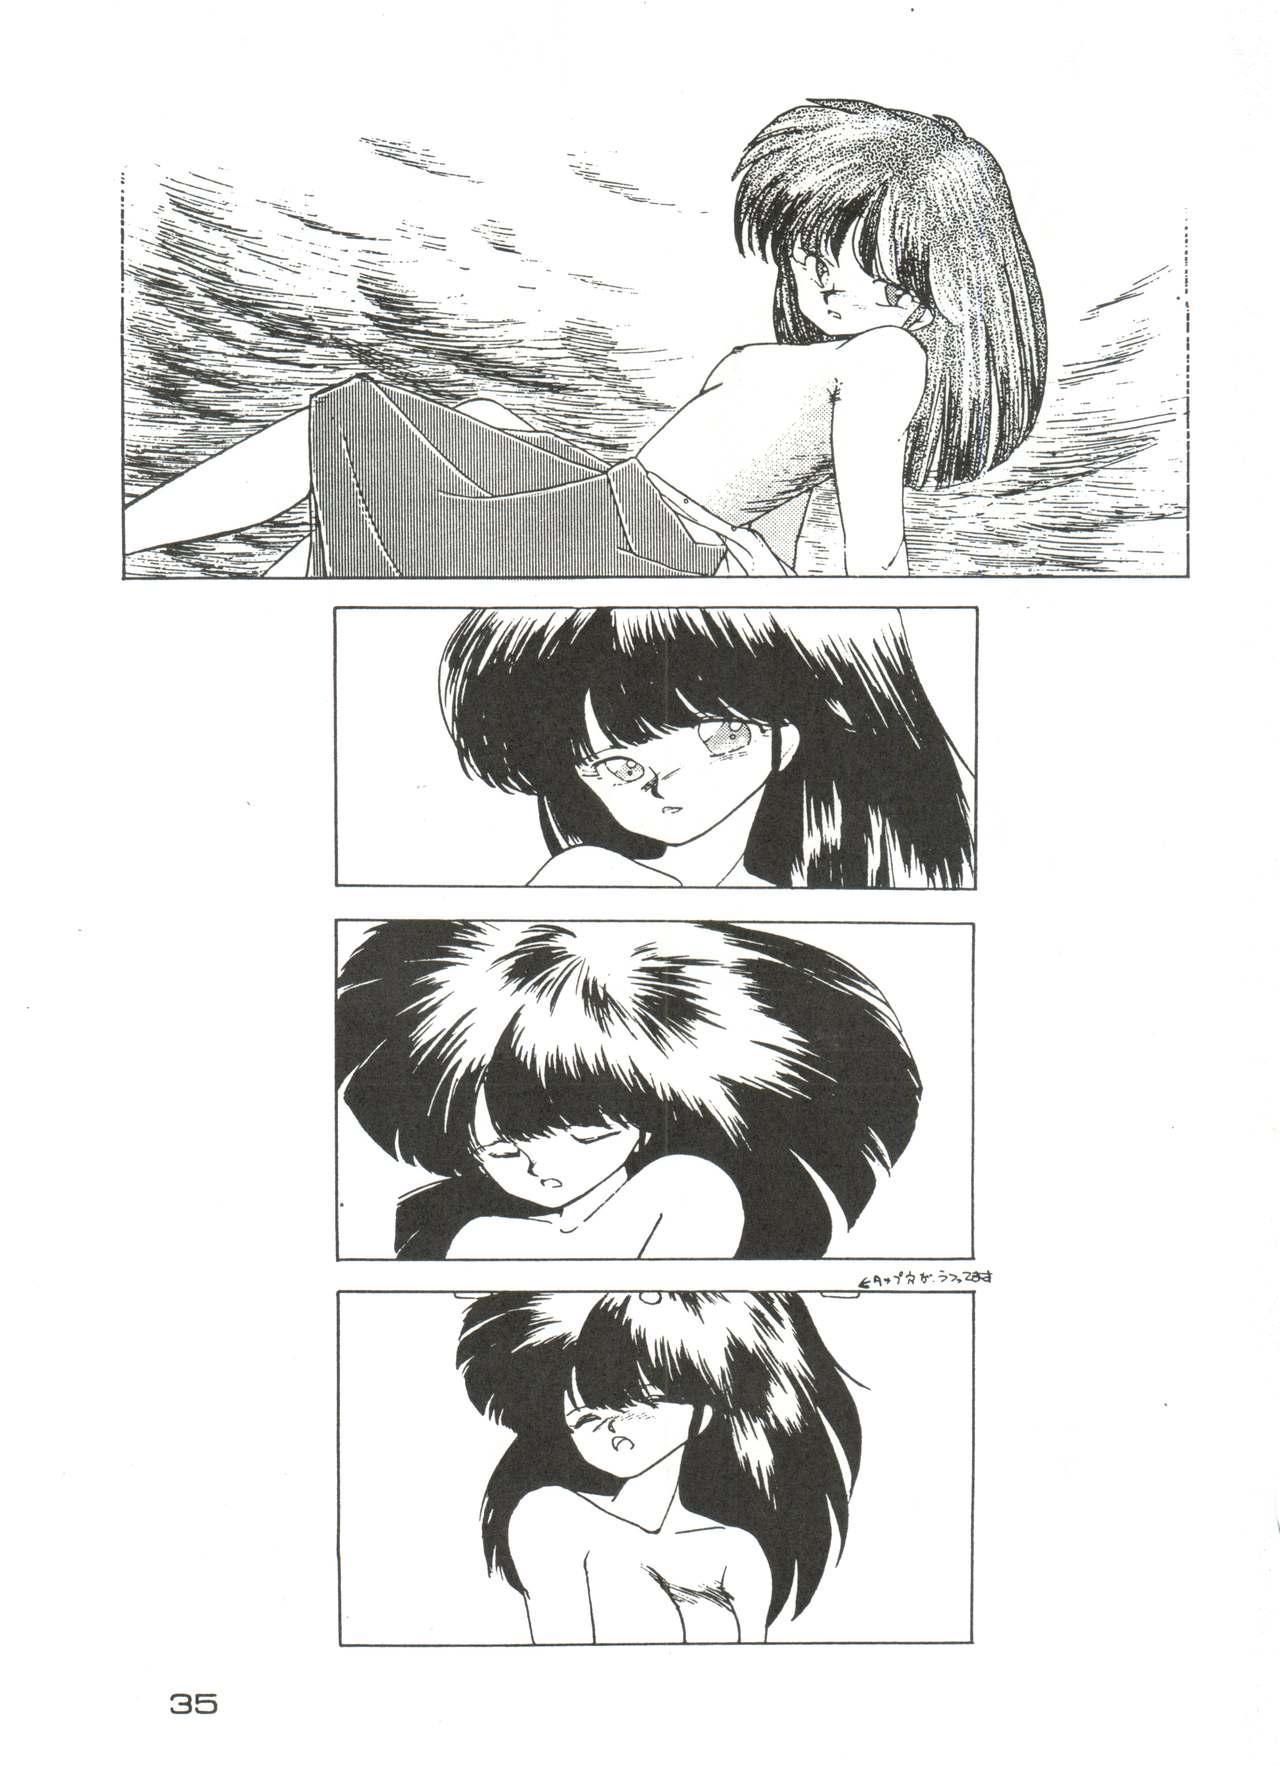 [Studio Fuck (Various) Onapet 7 (Sonic Soldier Borgman, Gundam ZZ, Osomatsu-kun) 34